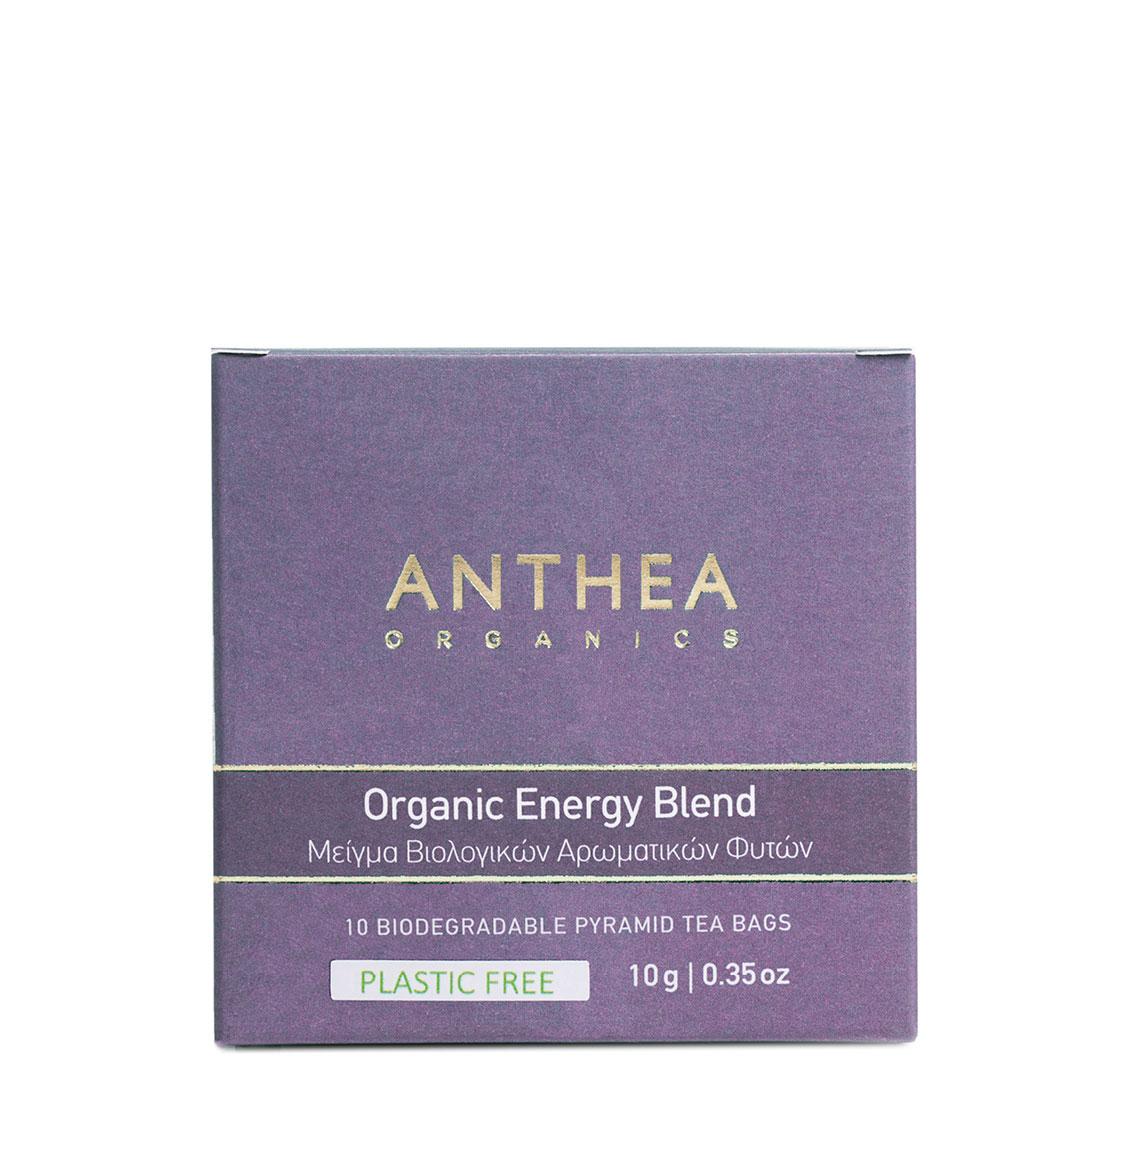 Anthea Organics Βιολογικό Μείγμα Βοτάνων Energy Blend 10 Plastic Free Pyramid Tea Bags